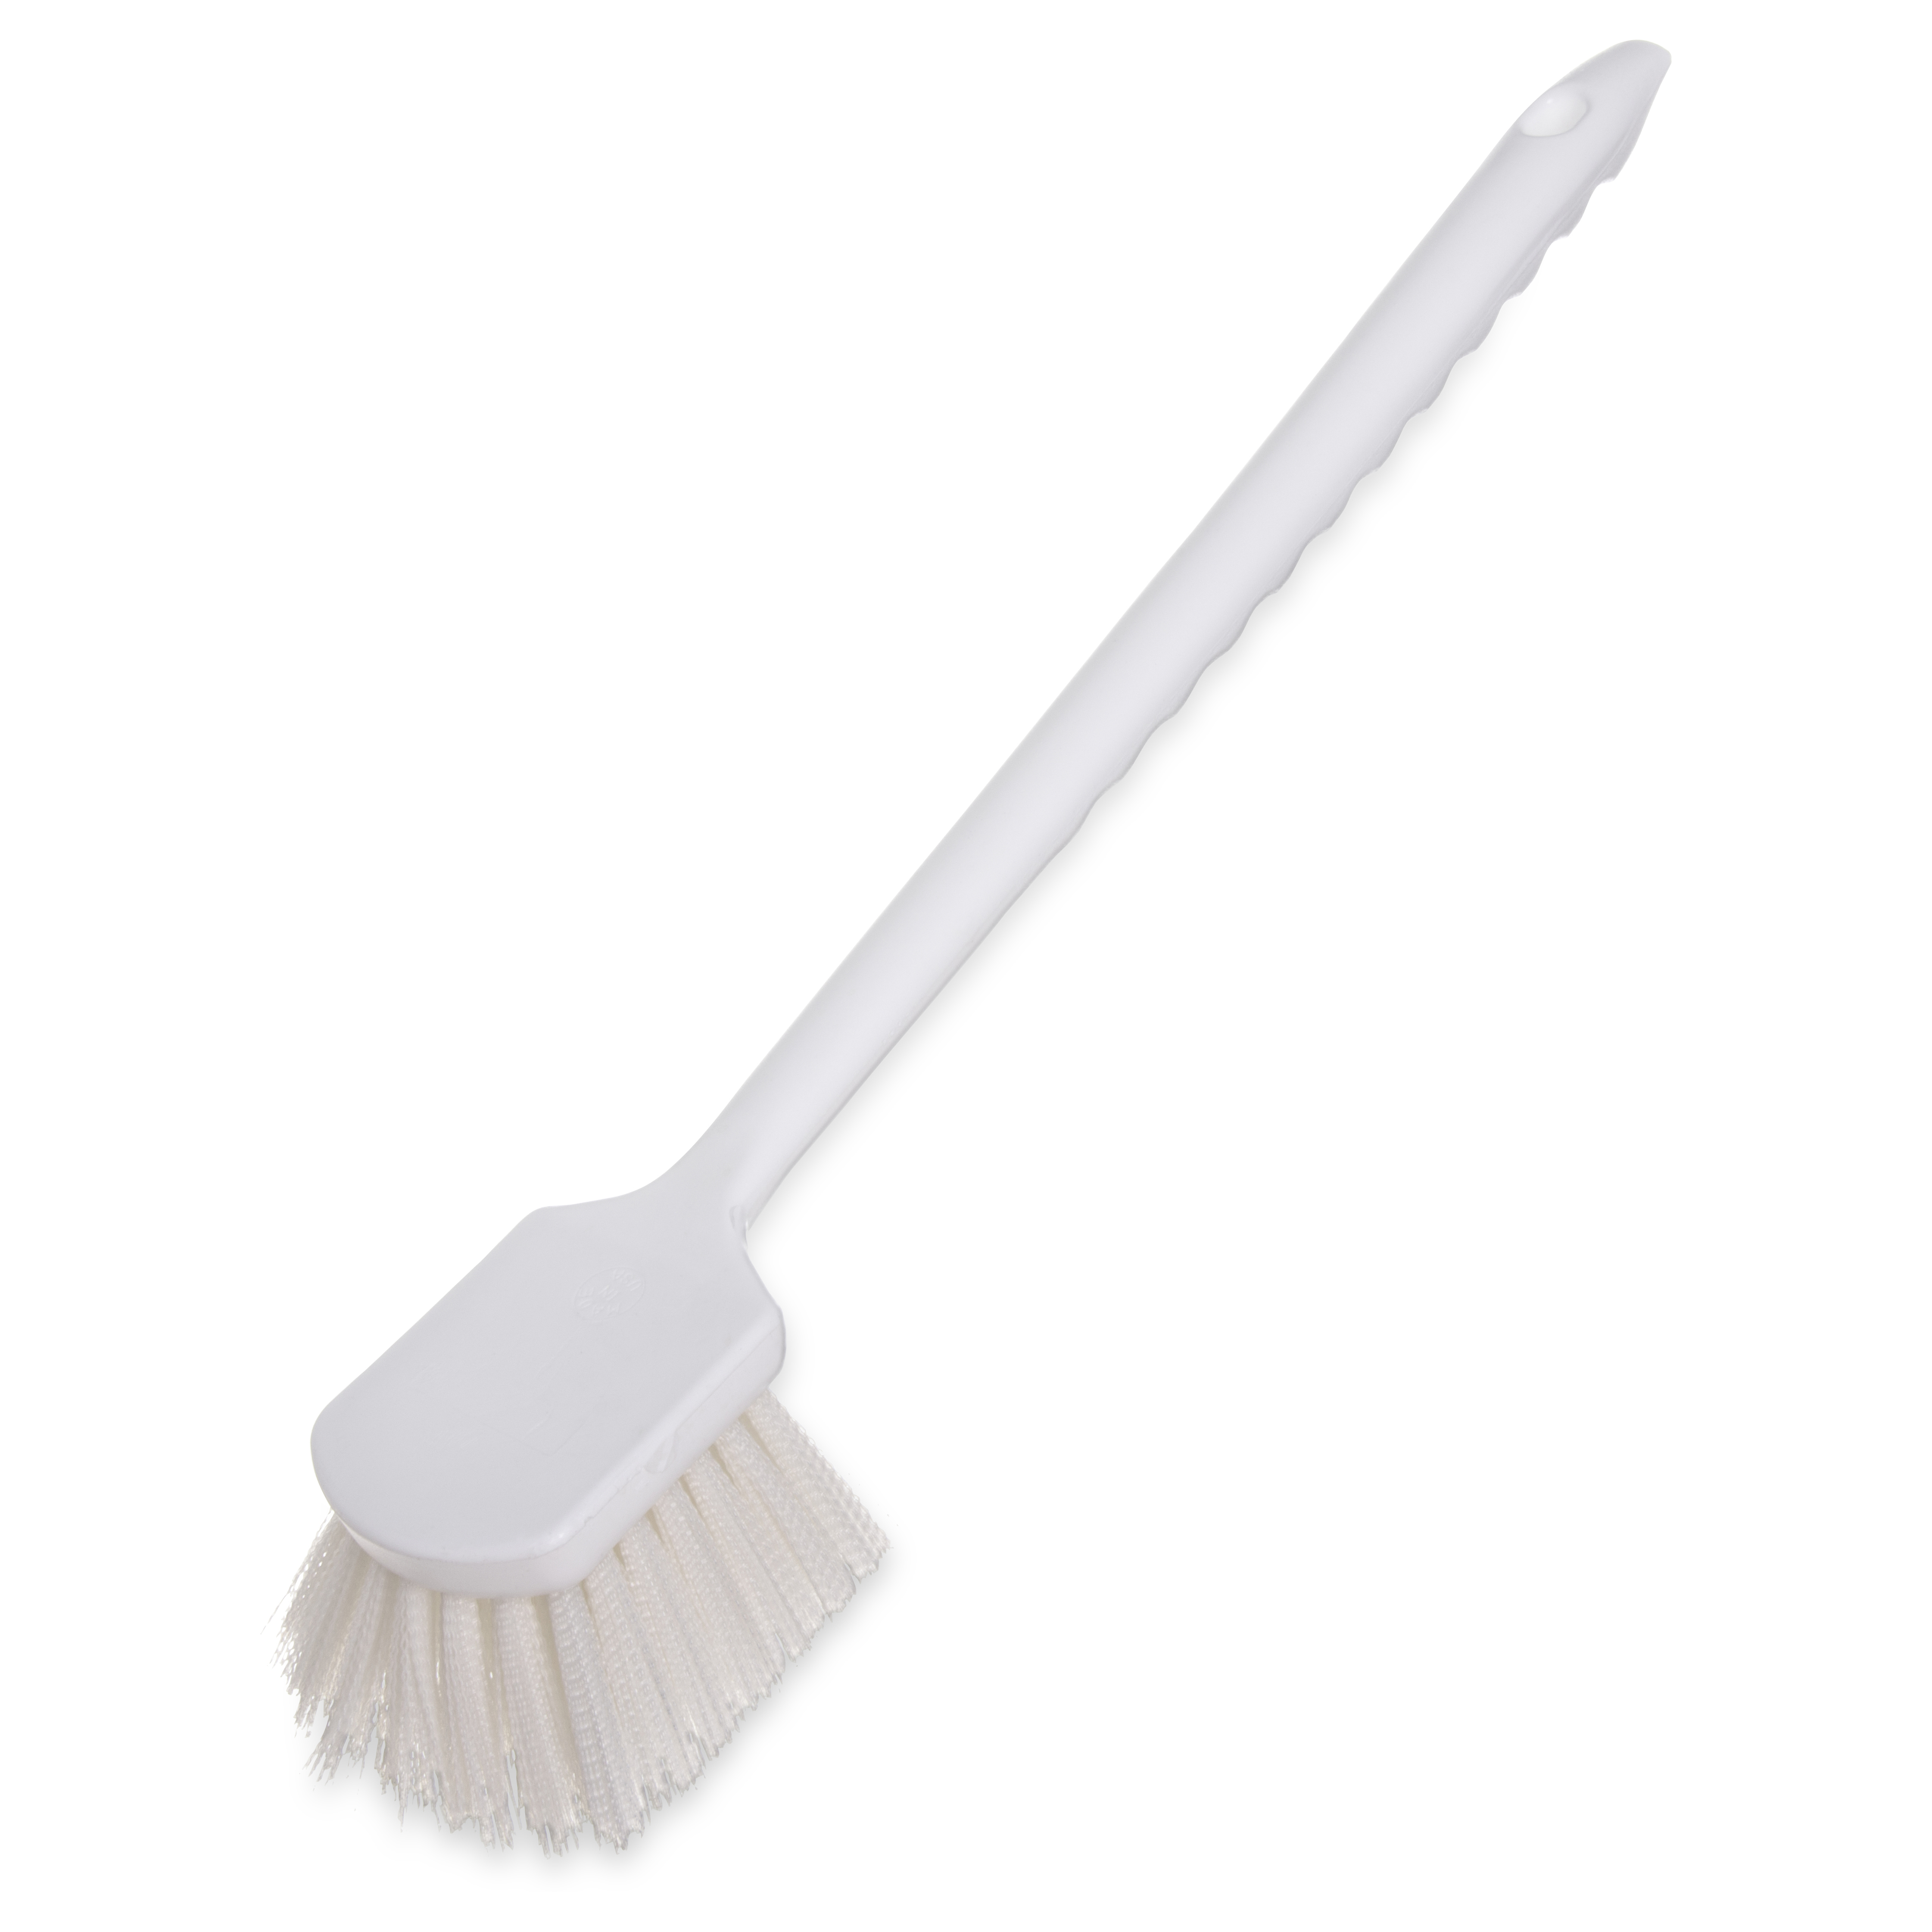 Carlisle 40501C02 brush, misc